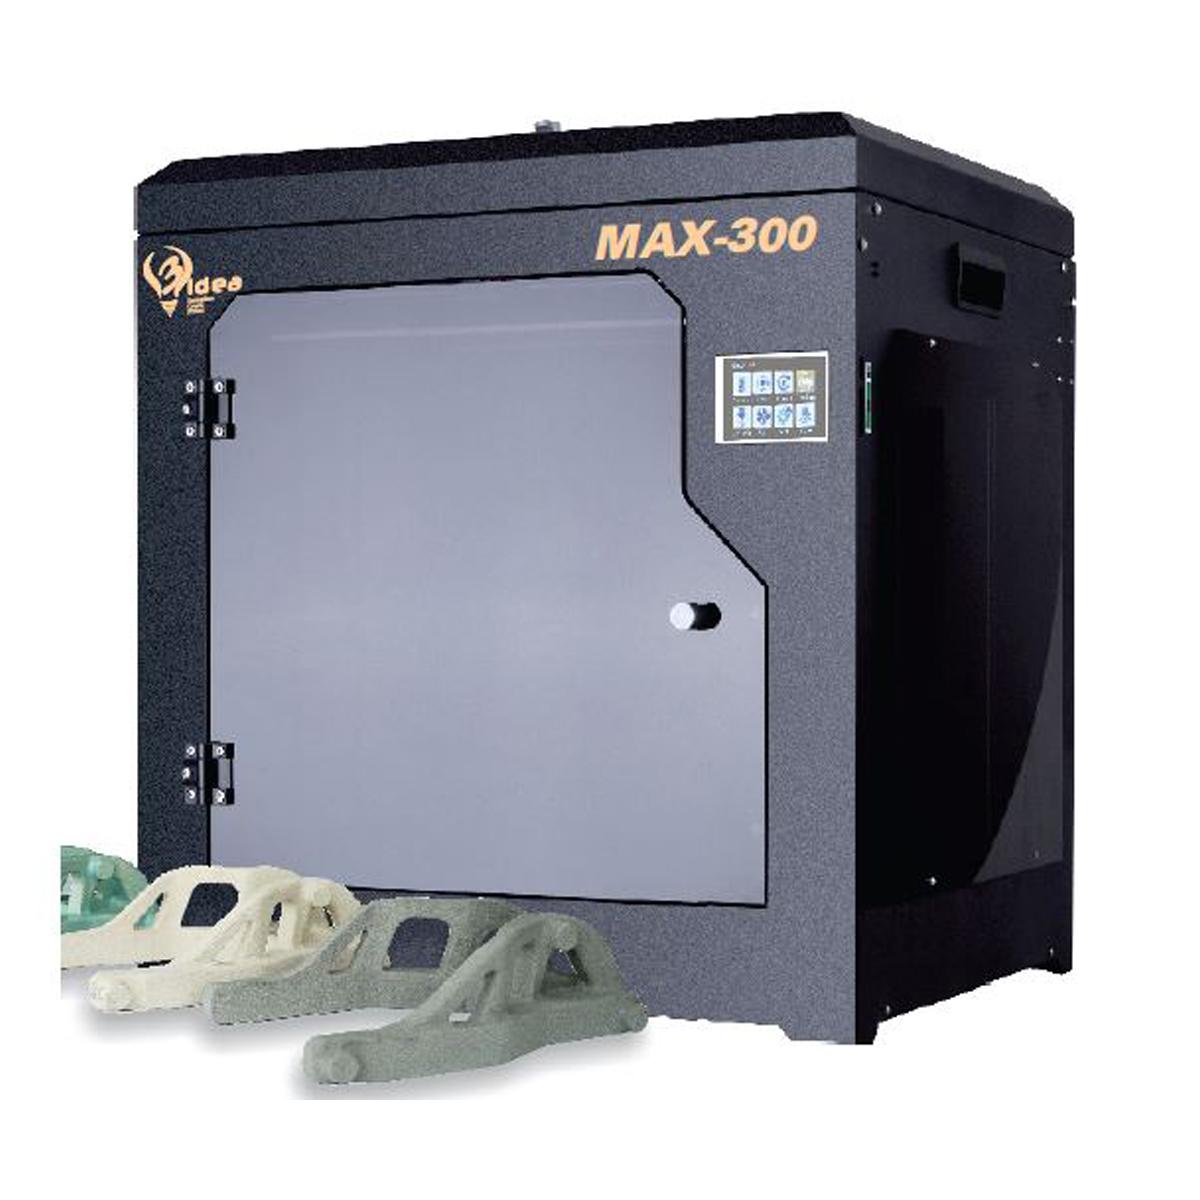 3Idea MAX-300